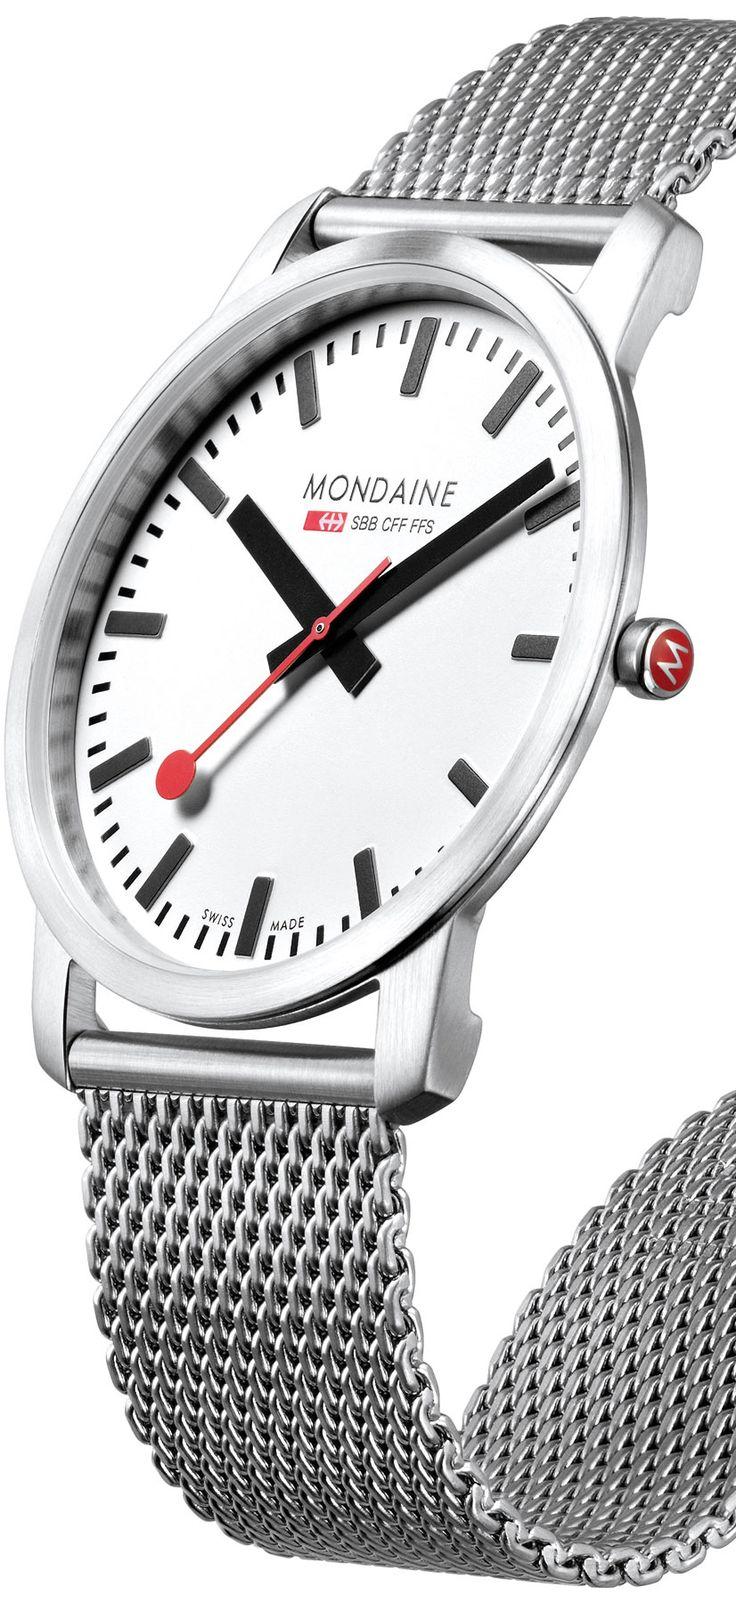 Mondaine Simply Elegant A672.30350.16SBM watch - Modern Watches from Watchismo.com